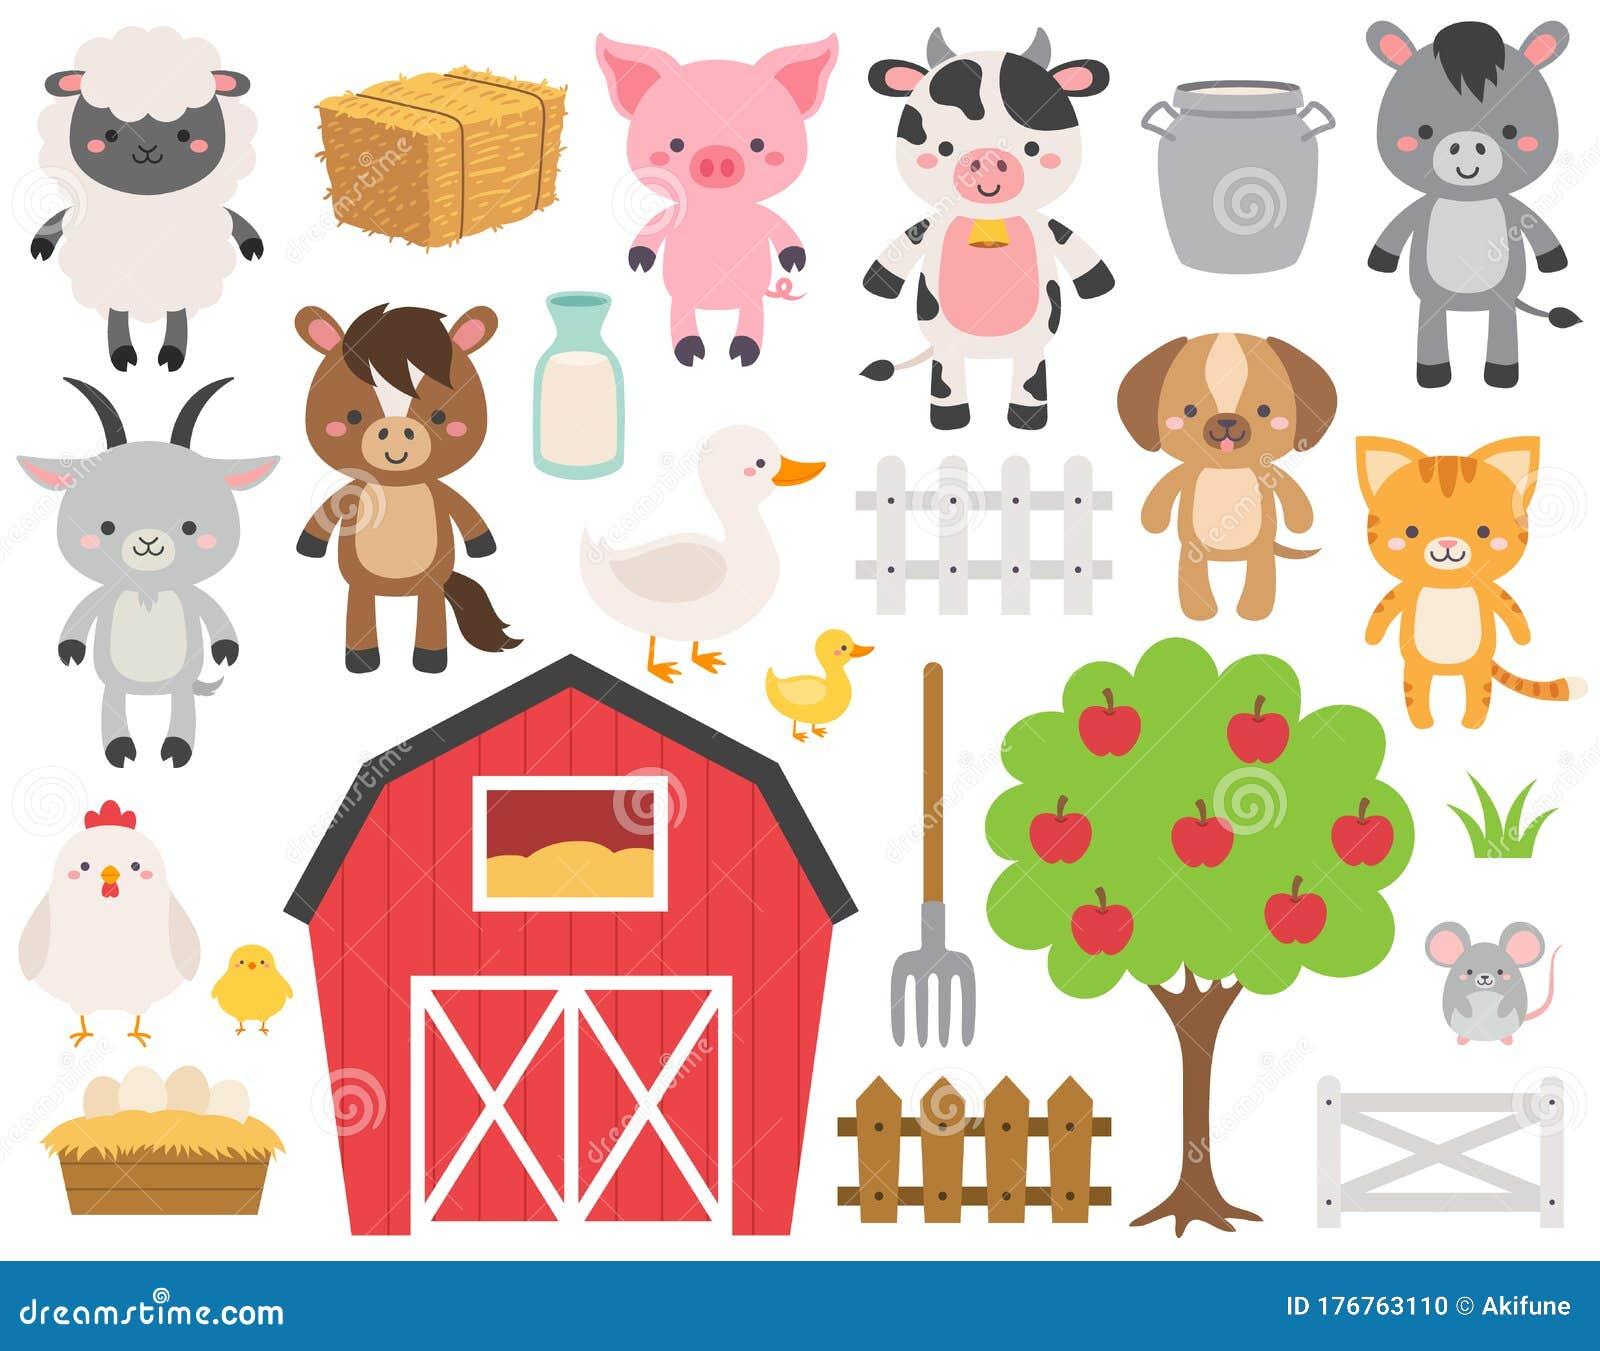 Cute Farm Animal Cartoon Set Vector Illustration Adorable Ranch Animals Clip Art Livestock Characters Flat Style Design Stock Vector Illustration Of Colors Bright 176763110